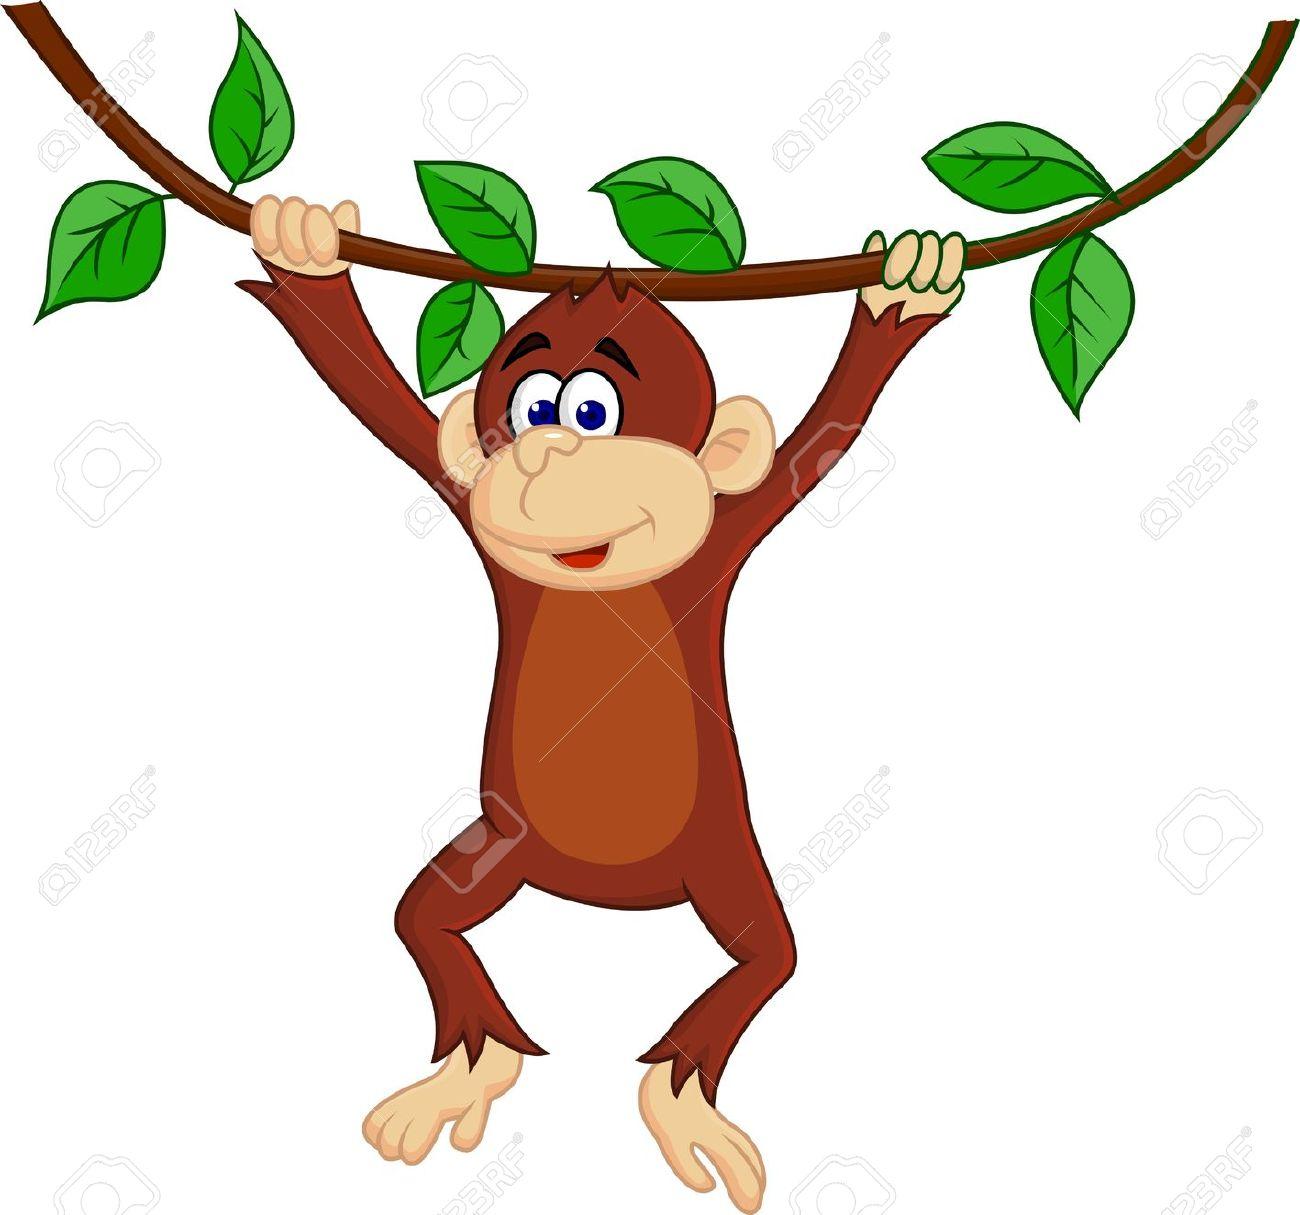 1300x1215 Chimpanzee clipart climbing tree